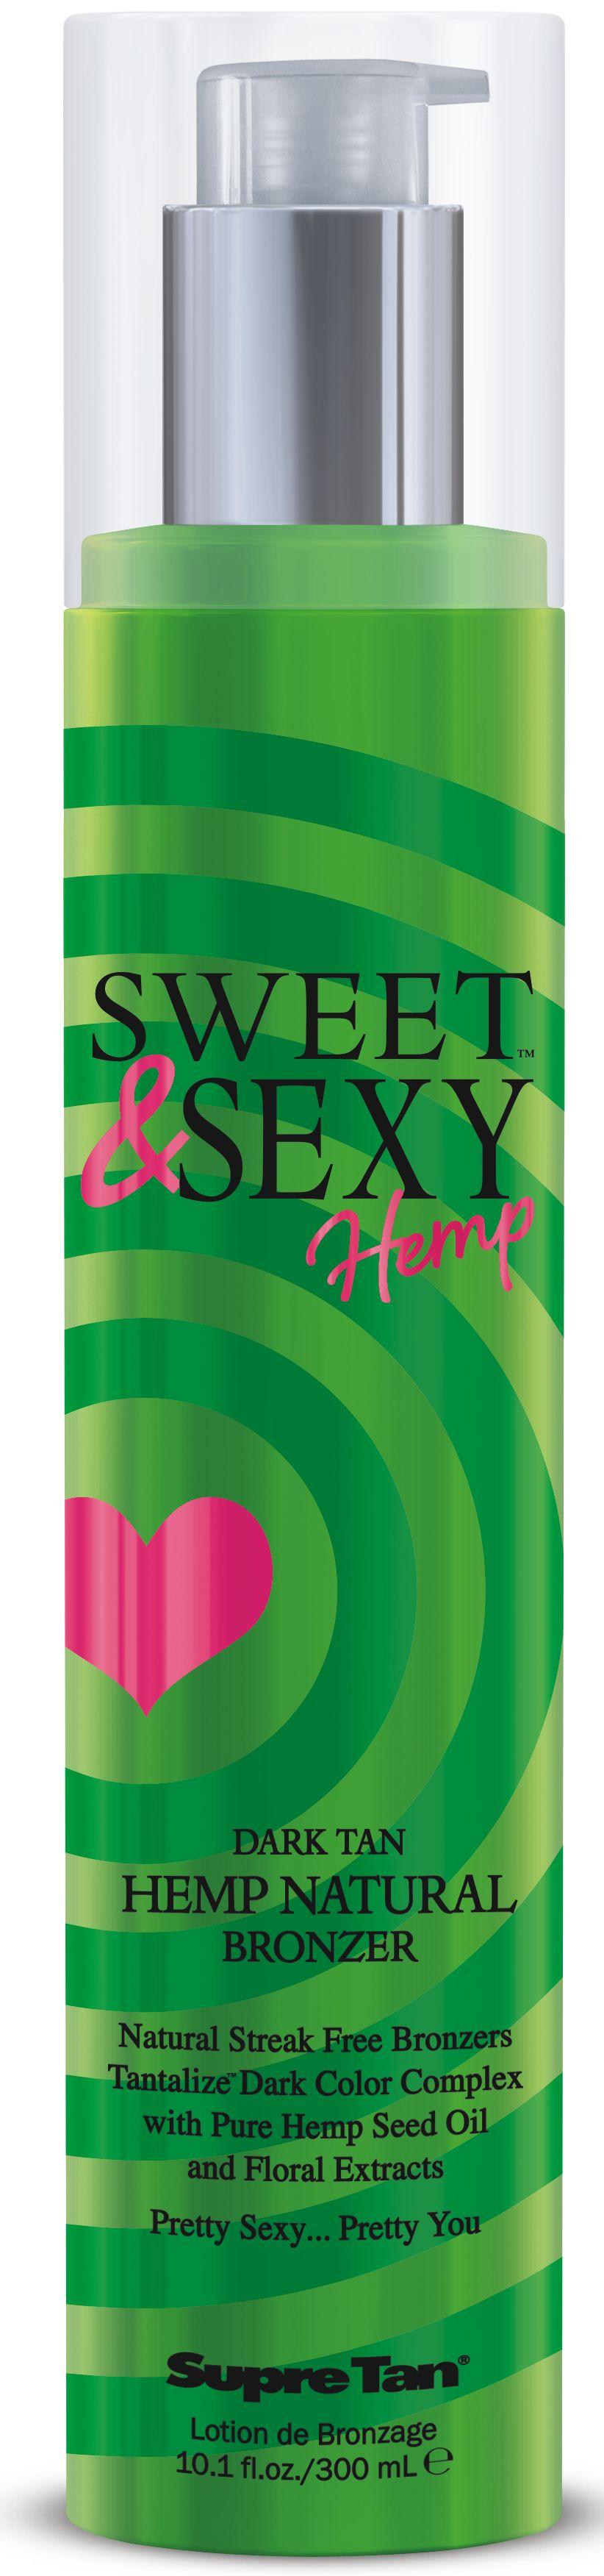 Sweet & Sexy™ Hemp Natural Bronzer